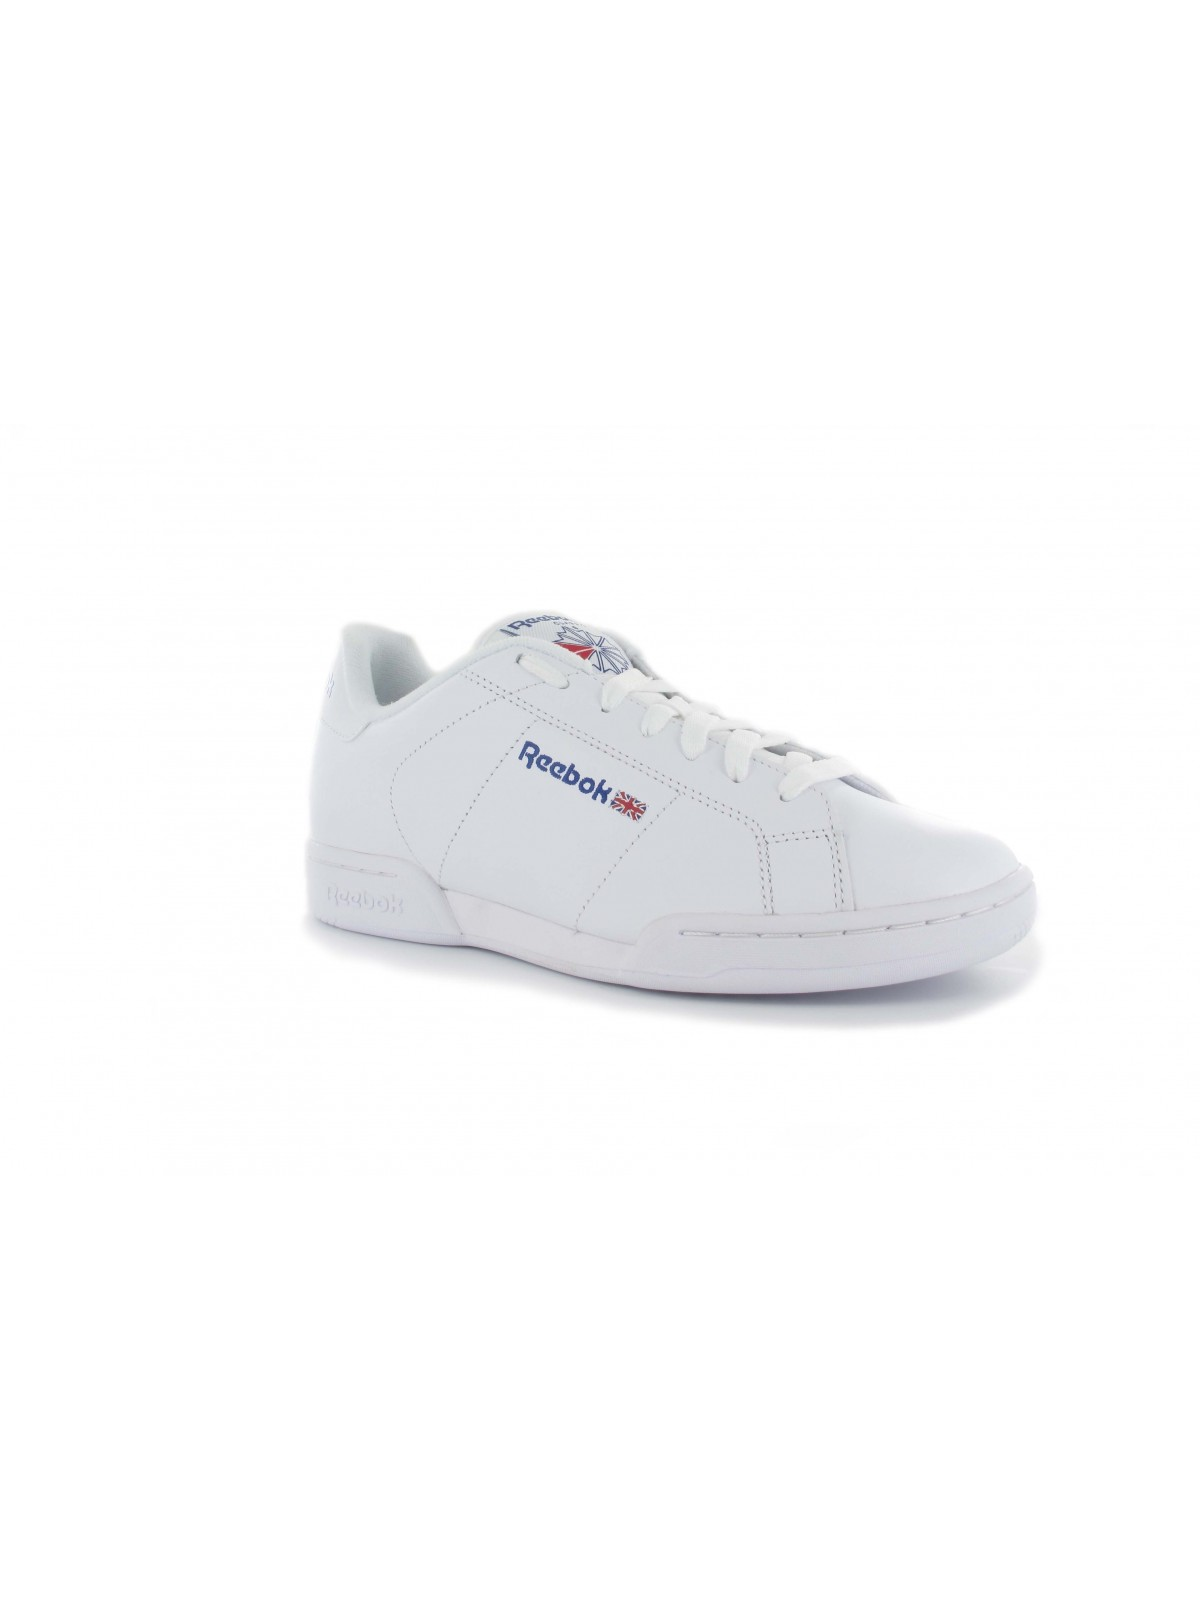 REEBOK Classics NPC2 junior cuir blanc